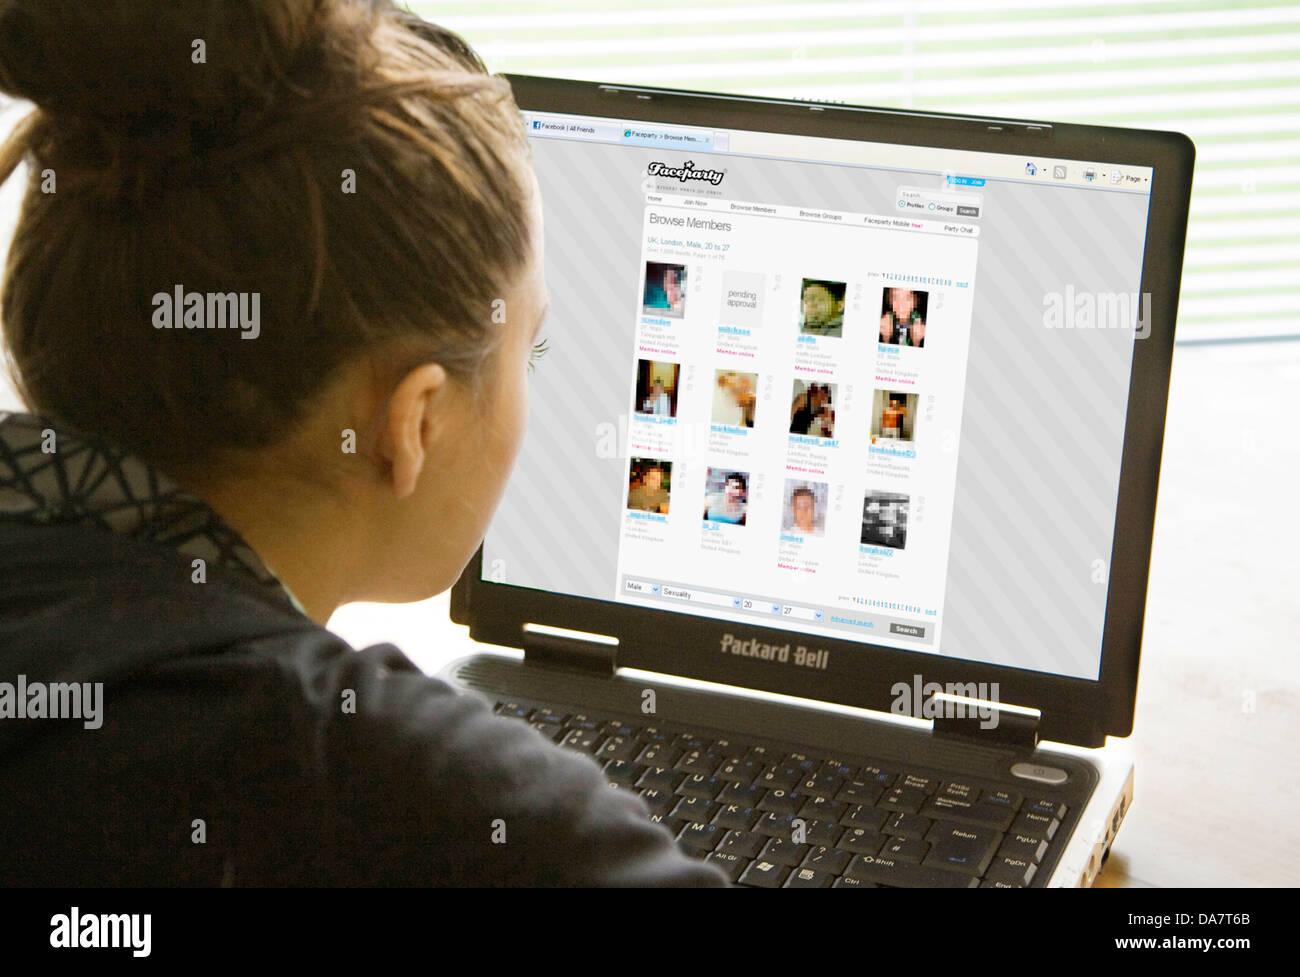 Dating sito giovane matchmaking oggi